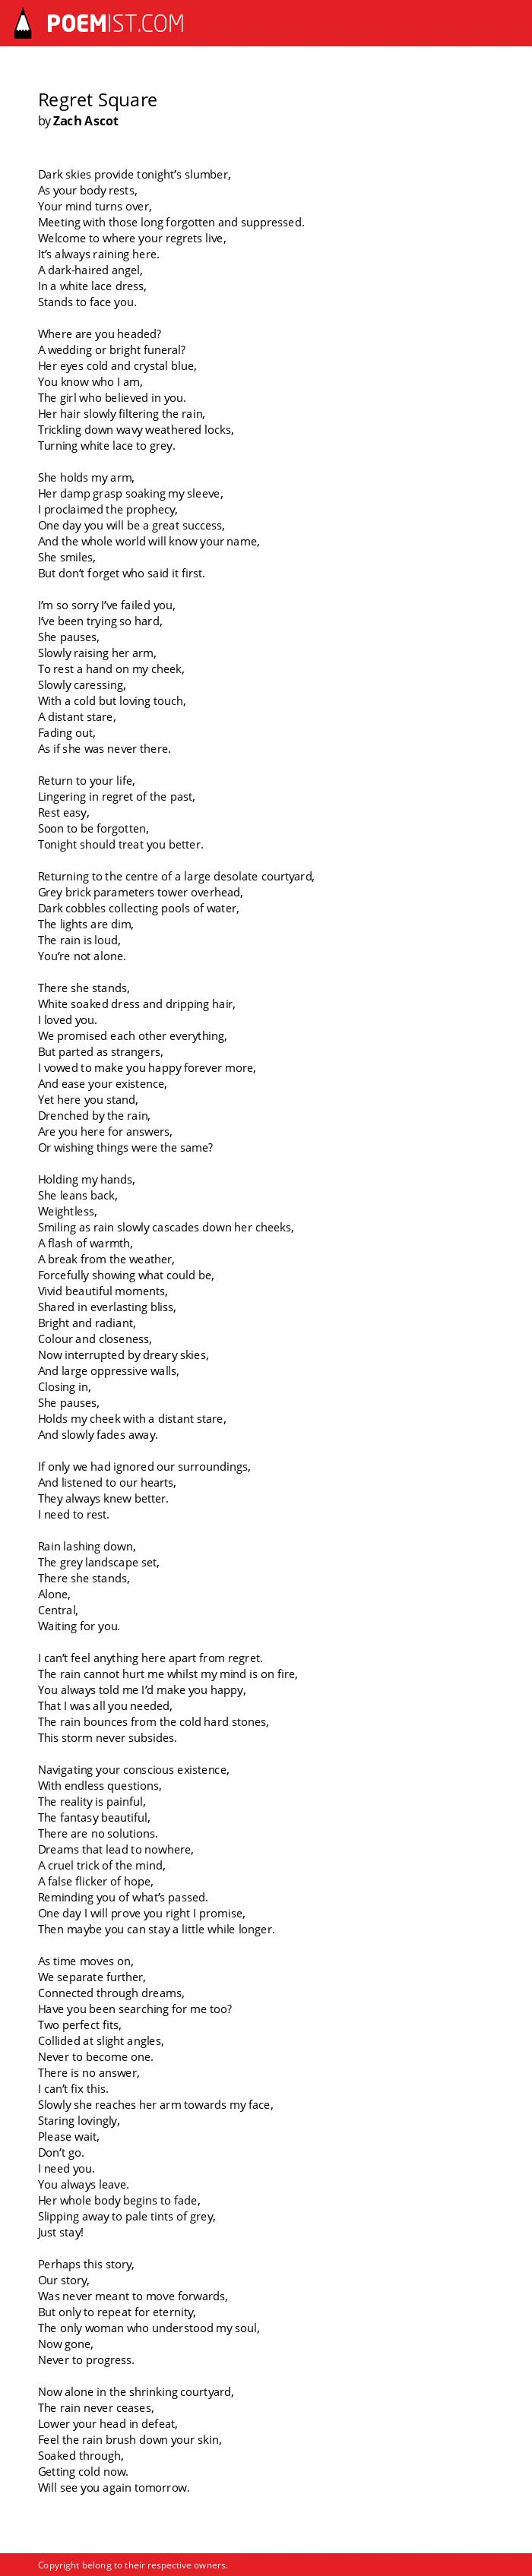 Regret Square by Zach Ascot | Poemist